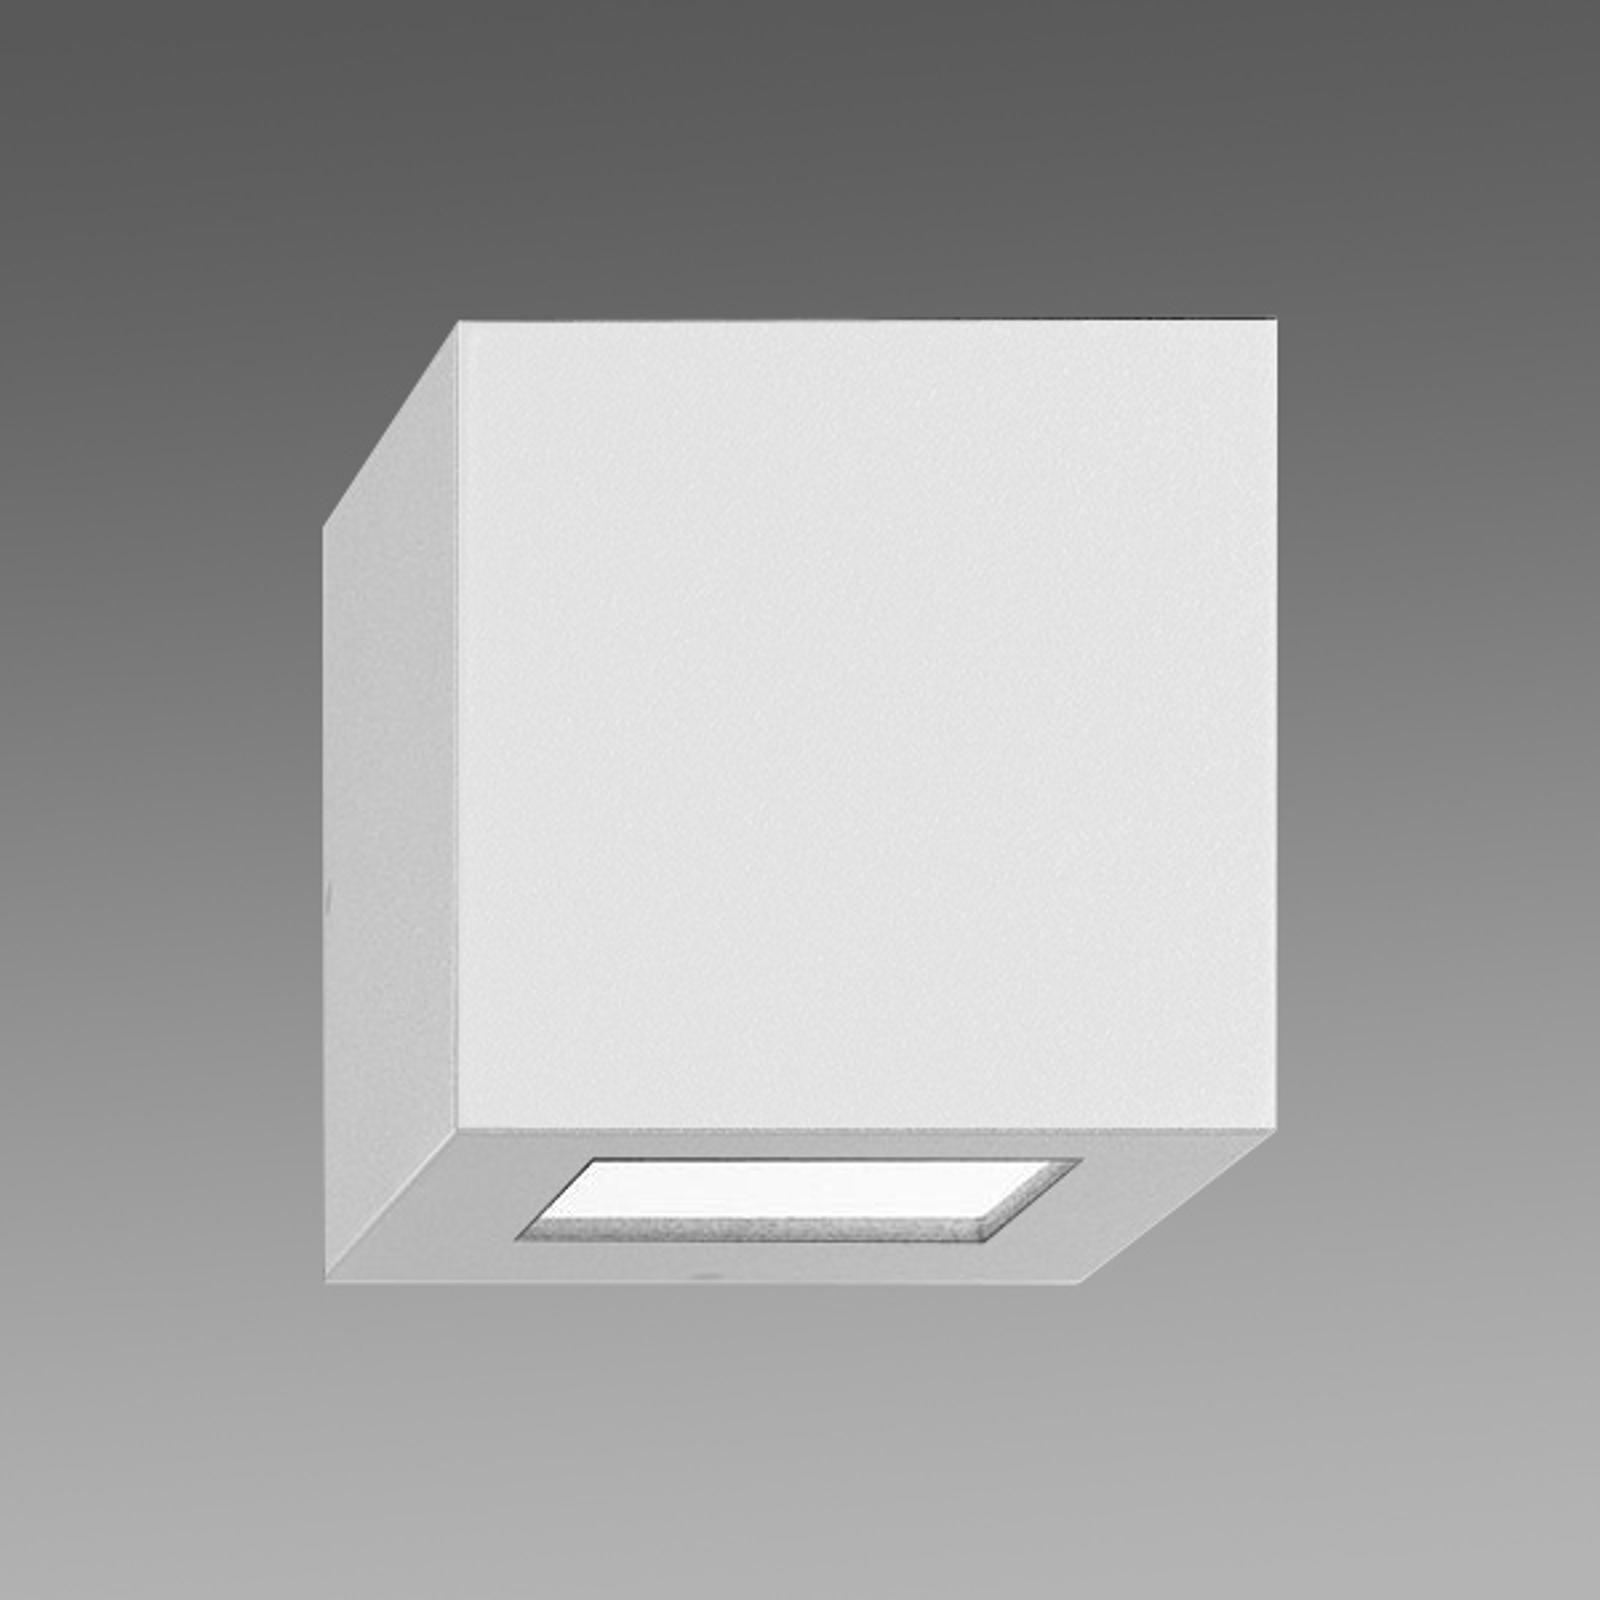 Effectrijke buitenwandlamp 700268 2W, wit